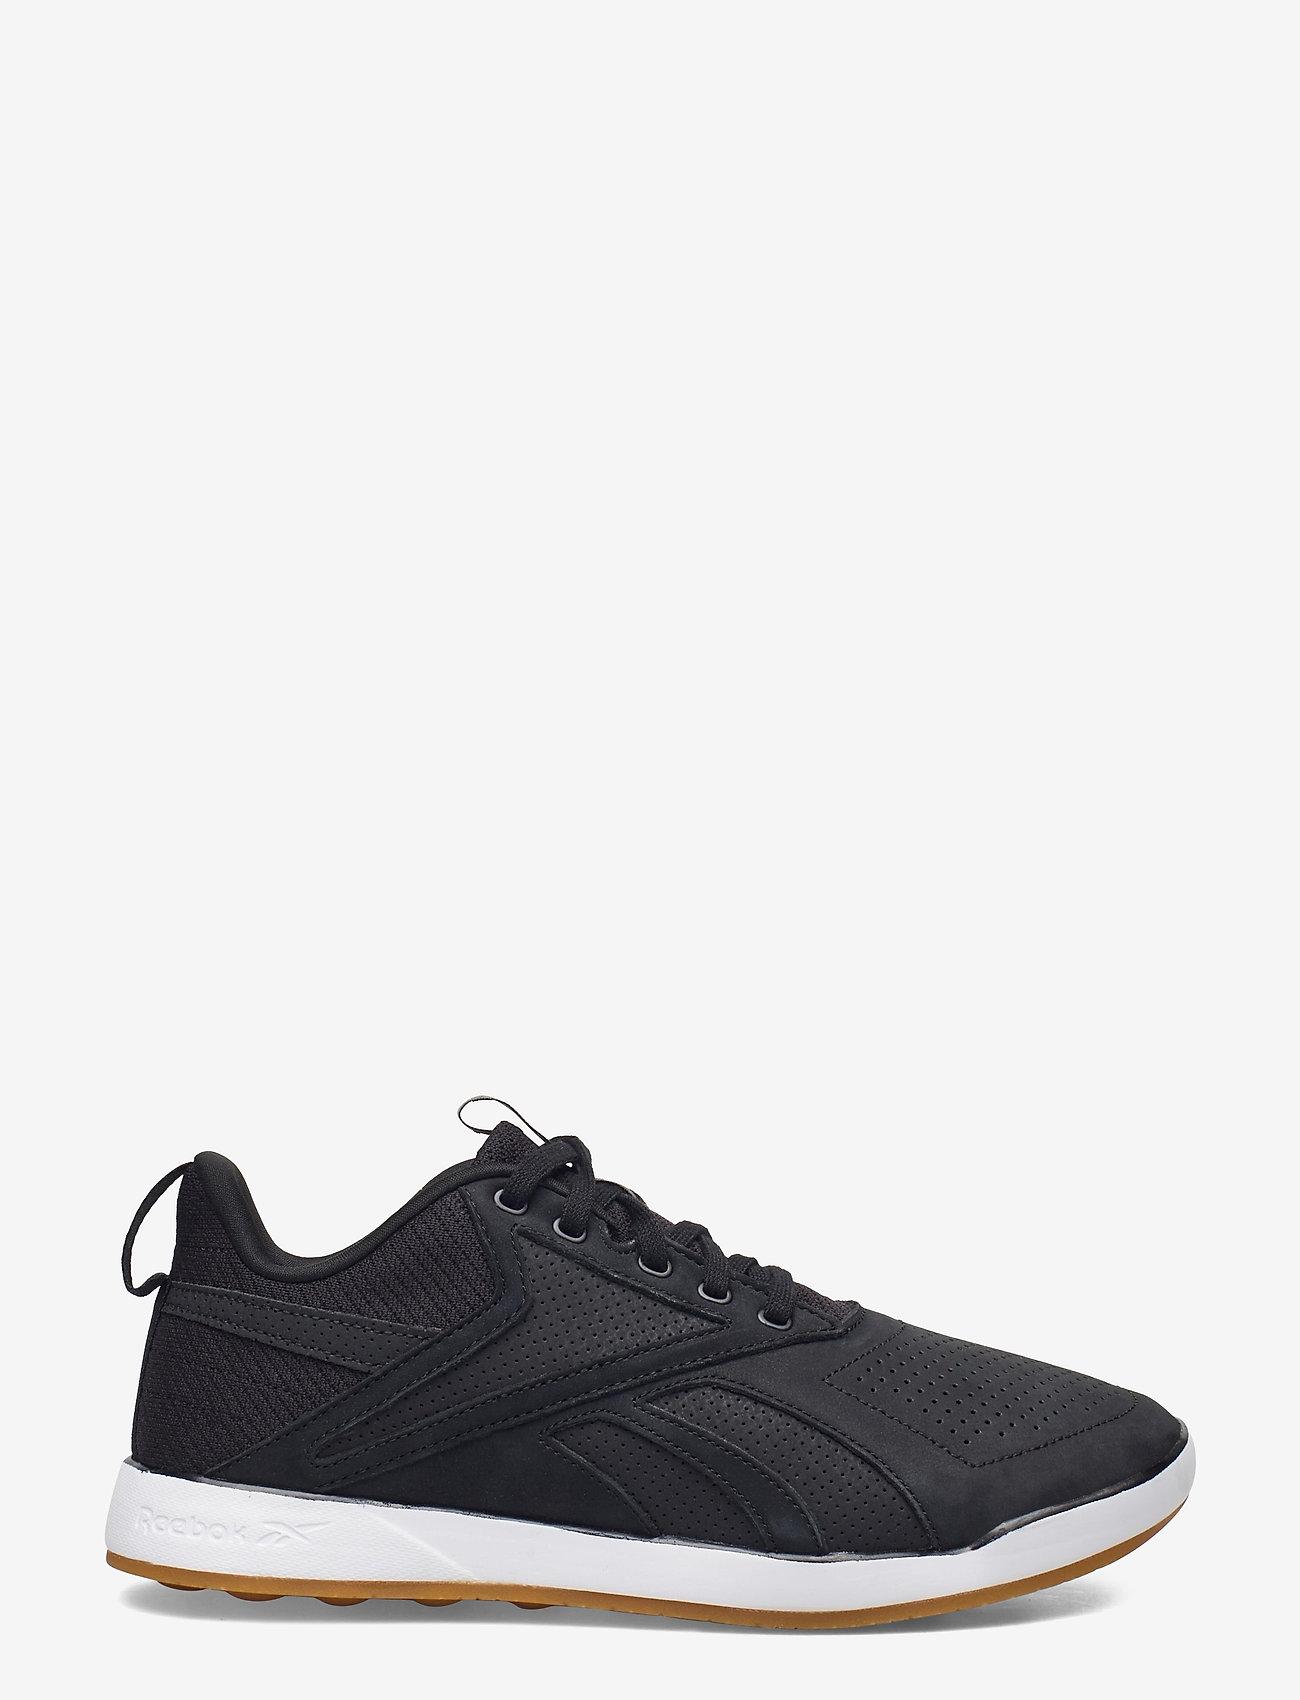 Reebok Performance - Reebok Ever Road DMX 3.0 LTHR - laag sneakers - black/white/rbkle7 - 0